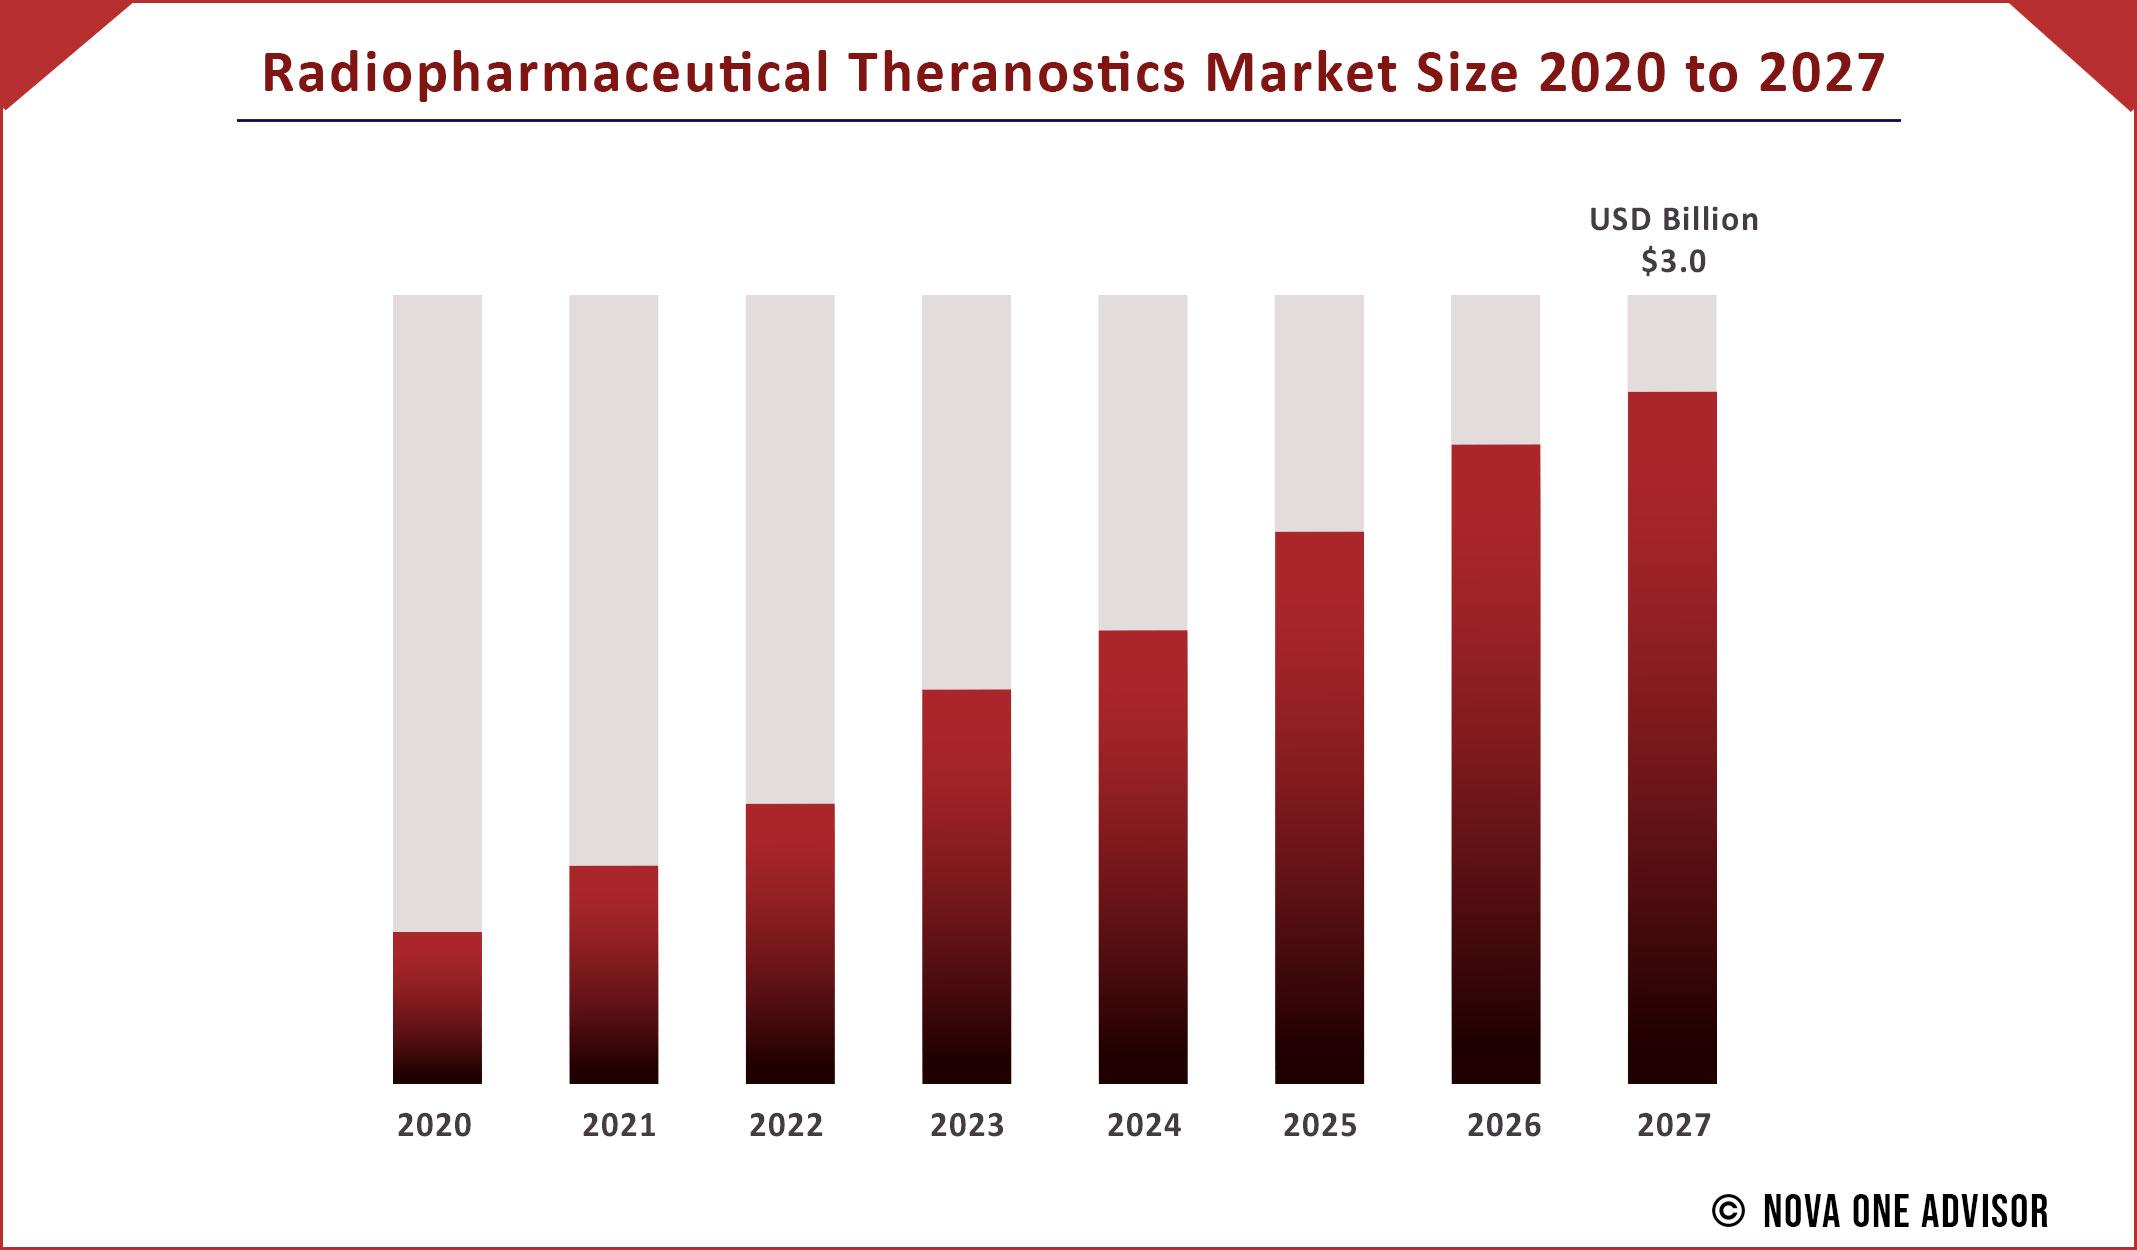 Radiopharmaceutical Theranostics Market Size 2020 to 2027